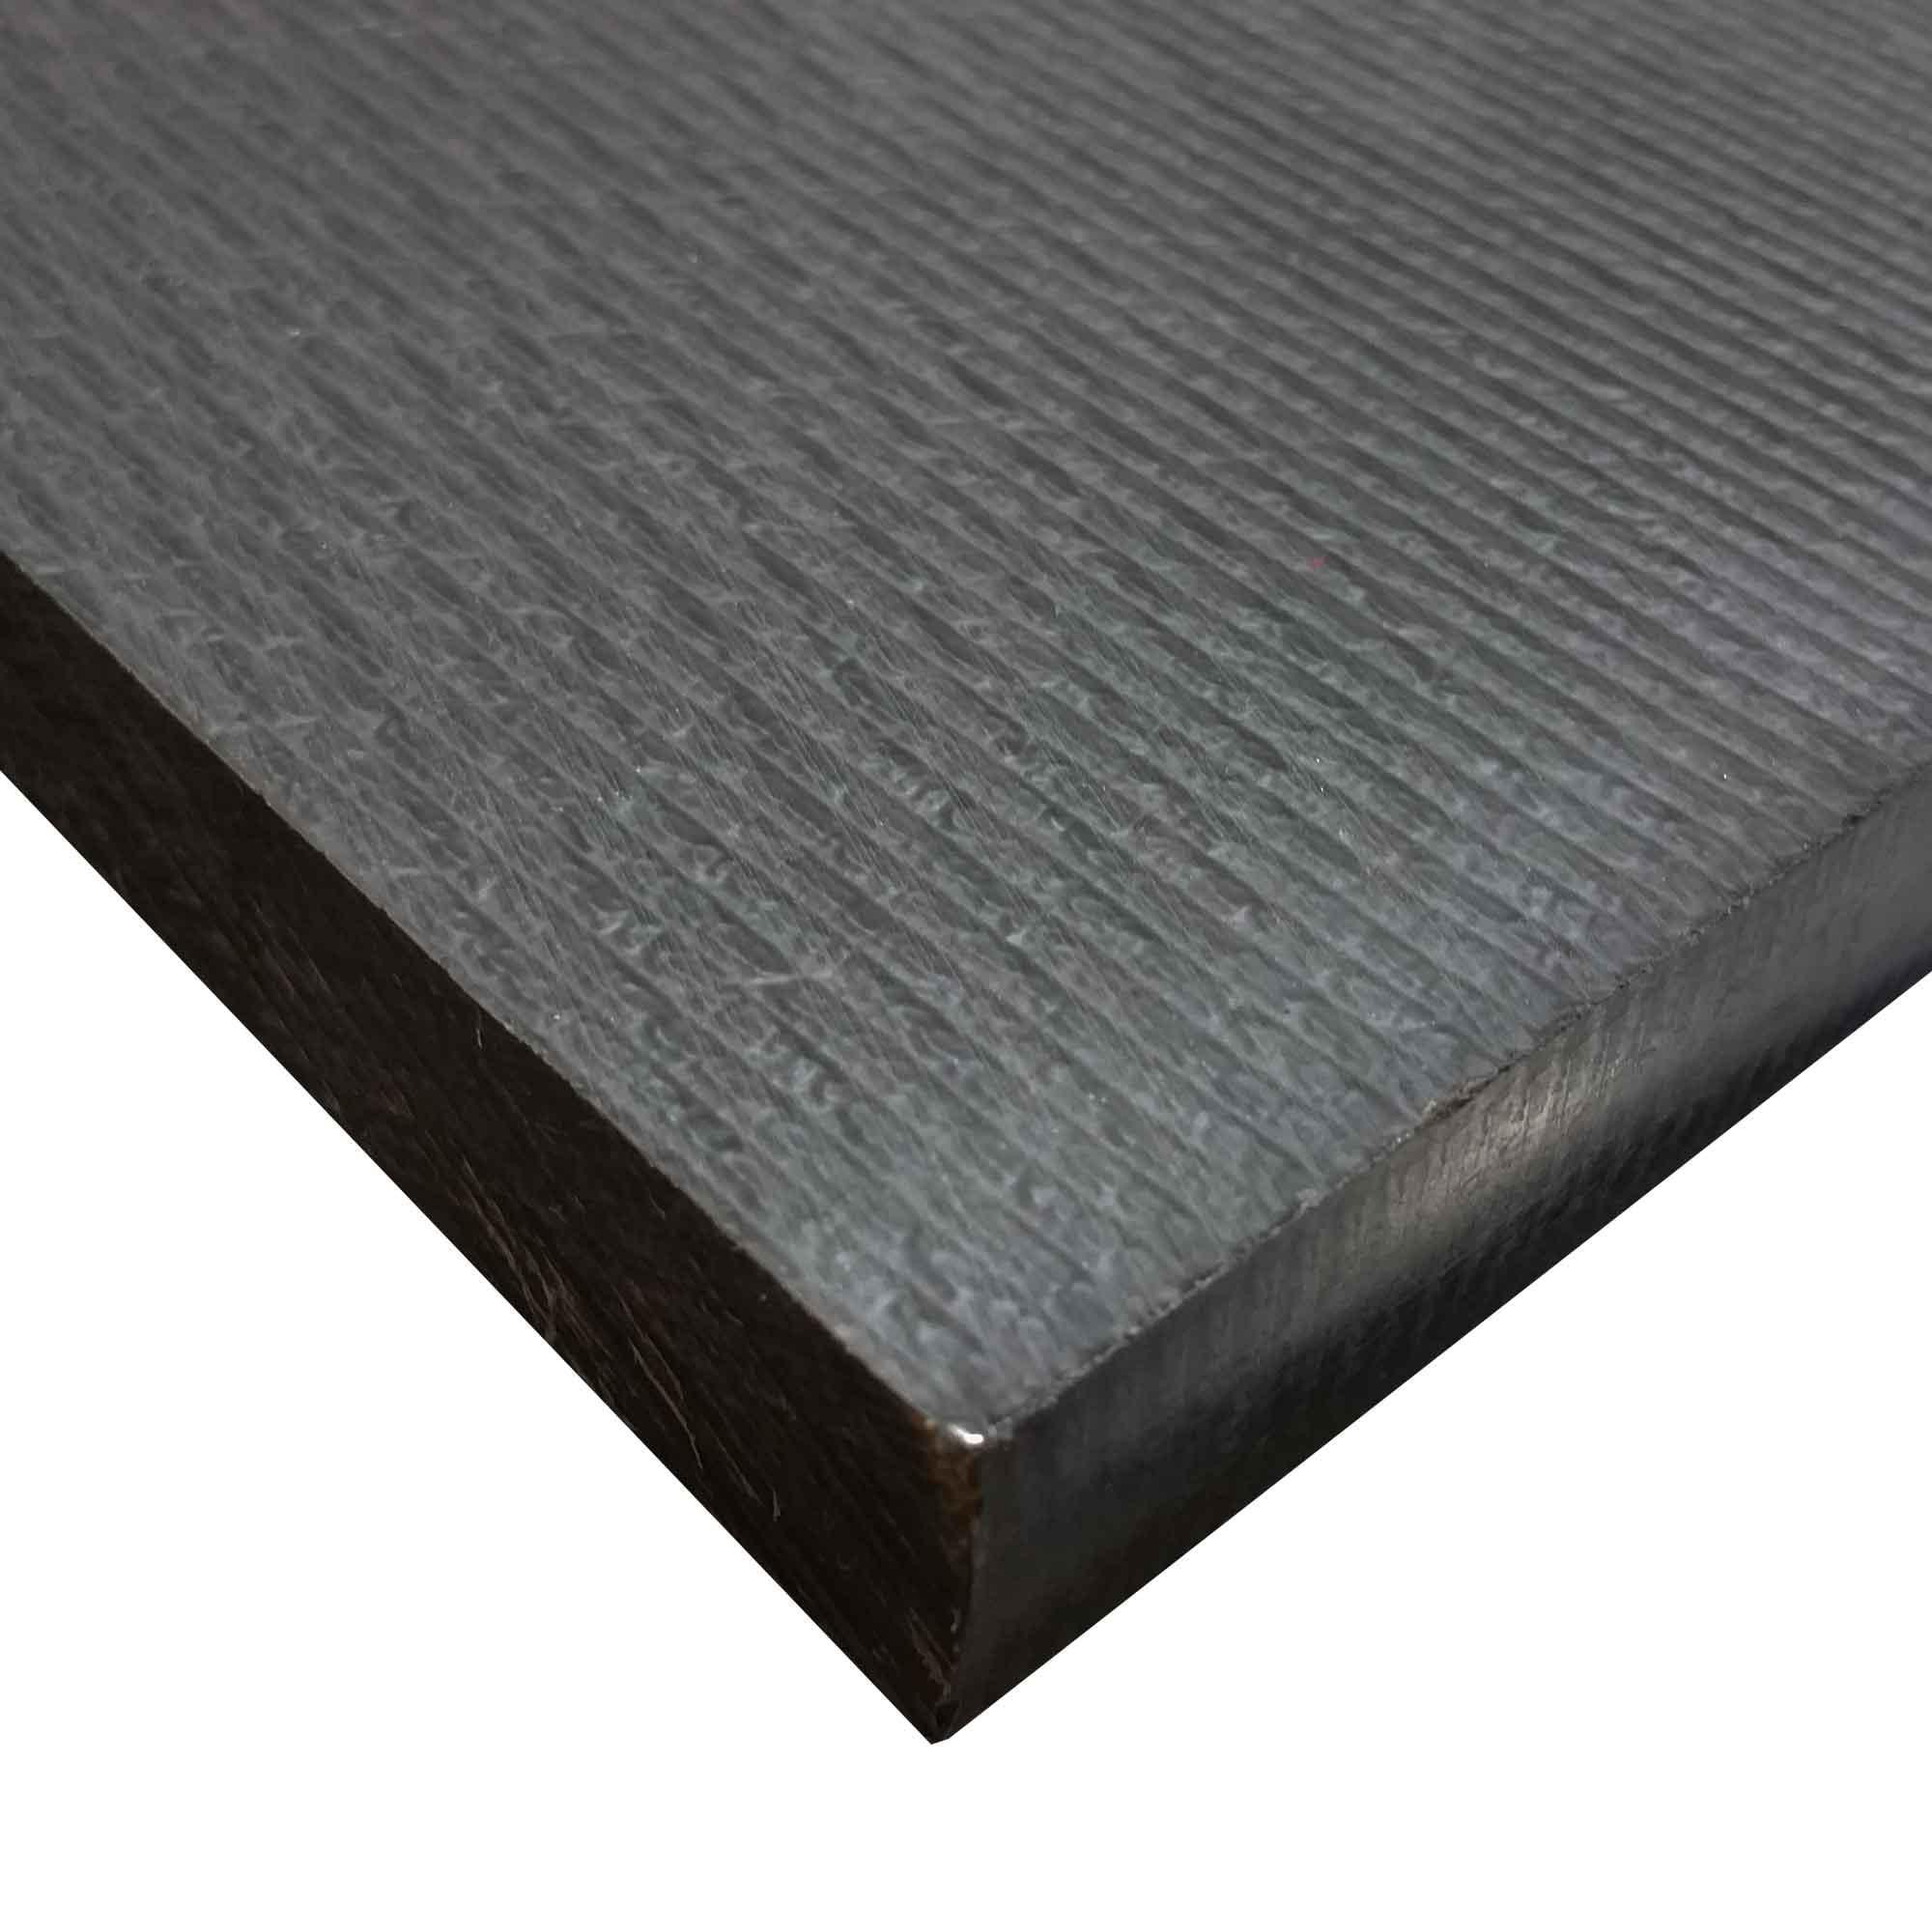 "Moly Filled Nylon 6/6 MDS Sheet 1/2"" x 10"" x 12"""